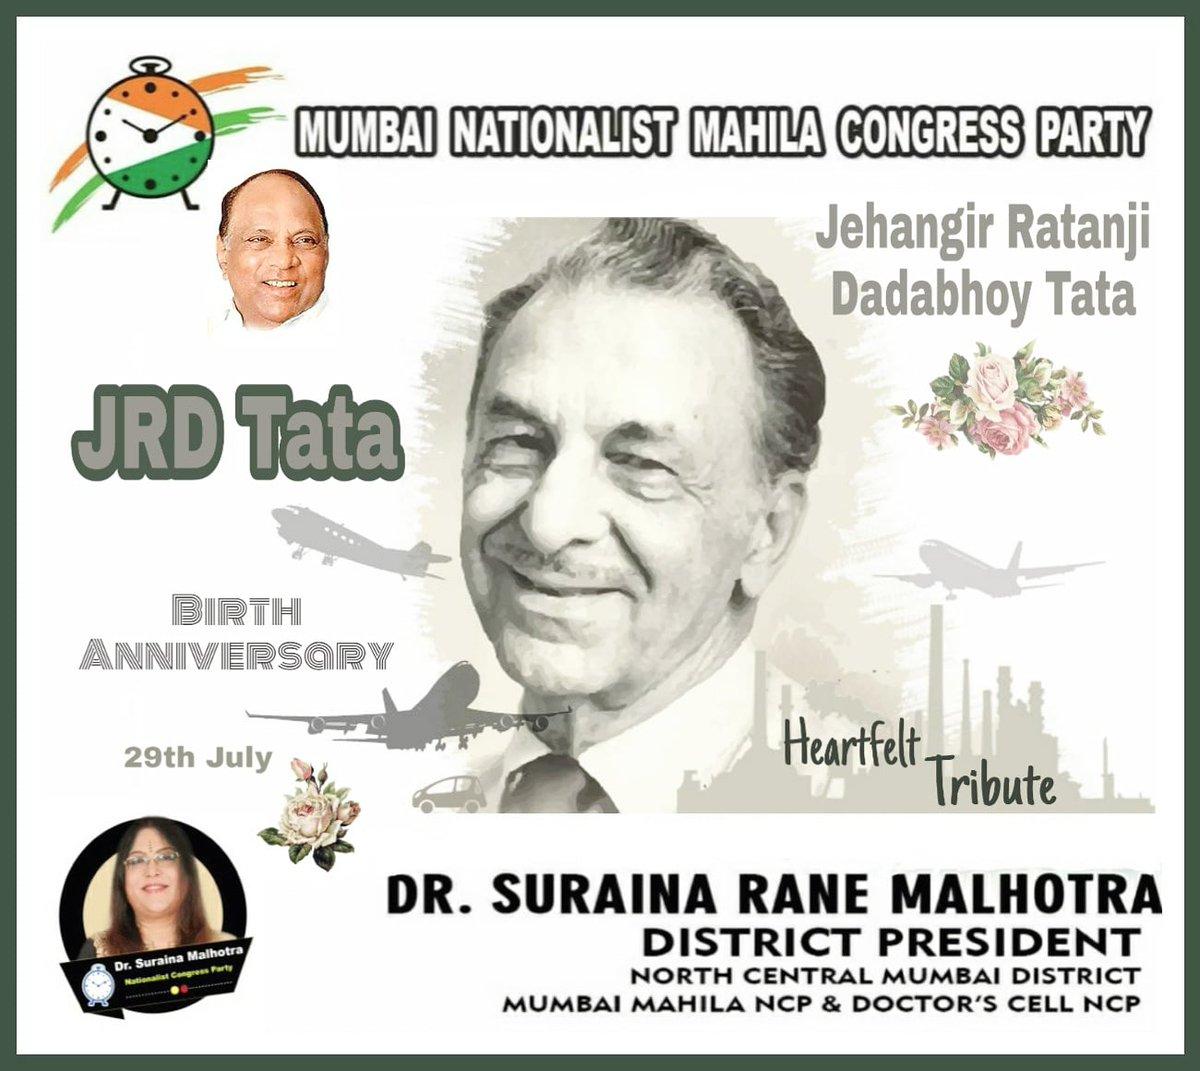 #HumbleTribute to #industrialist, #philanthropist & #father_of_Indian_Civil_Aviation, #BharatRatna Shri. #Jehangir_Ratanji_Dadabhoy #JRD_Tata ji on his #Birth_Anniversary. @TataCompanies #JRDTata  #DrSurainaMalhotra @supriya_sule @PawarSpeaks @Jayant_R_Patil @AjitPawarSpeakspic.twitter.com/nnpMCWmmpf